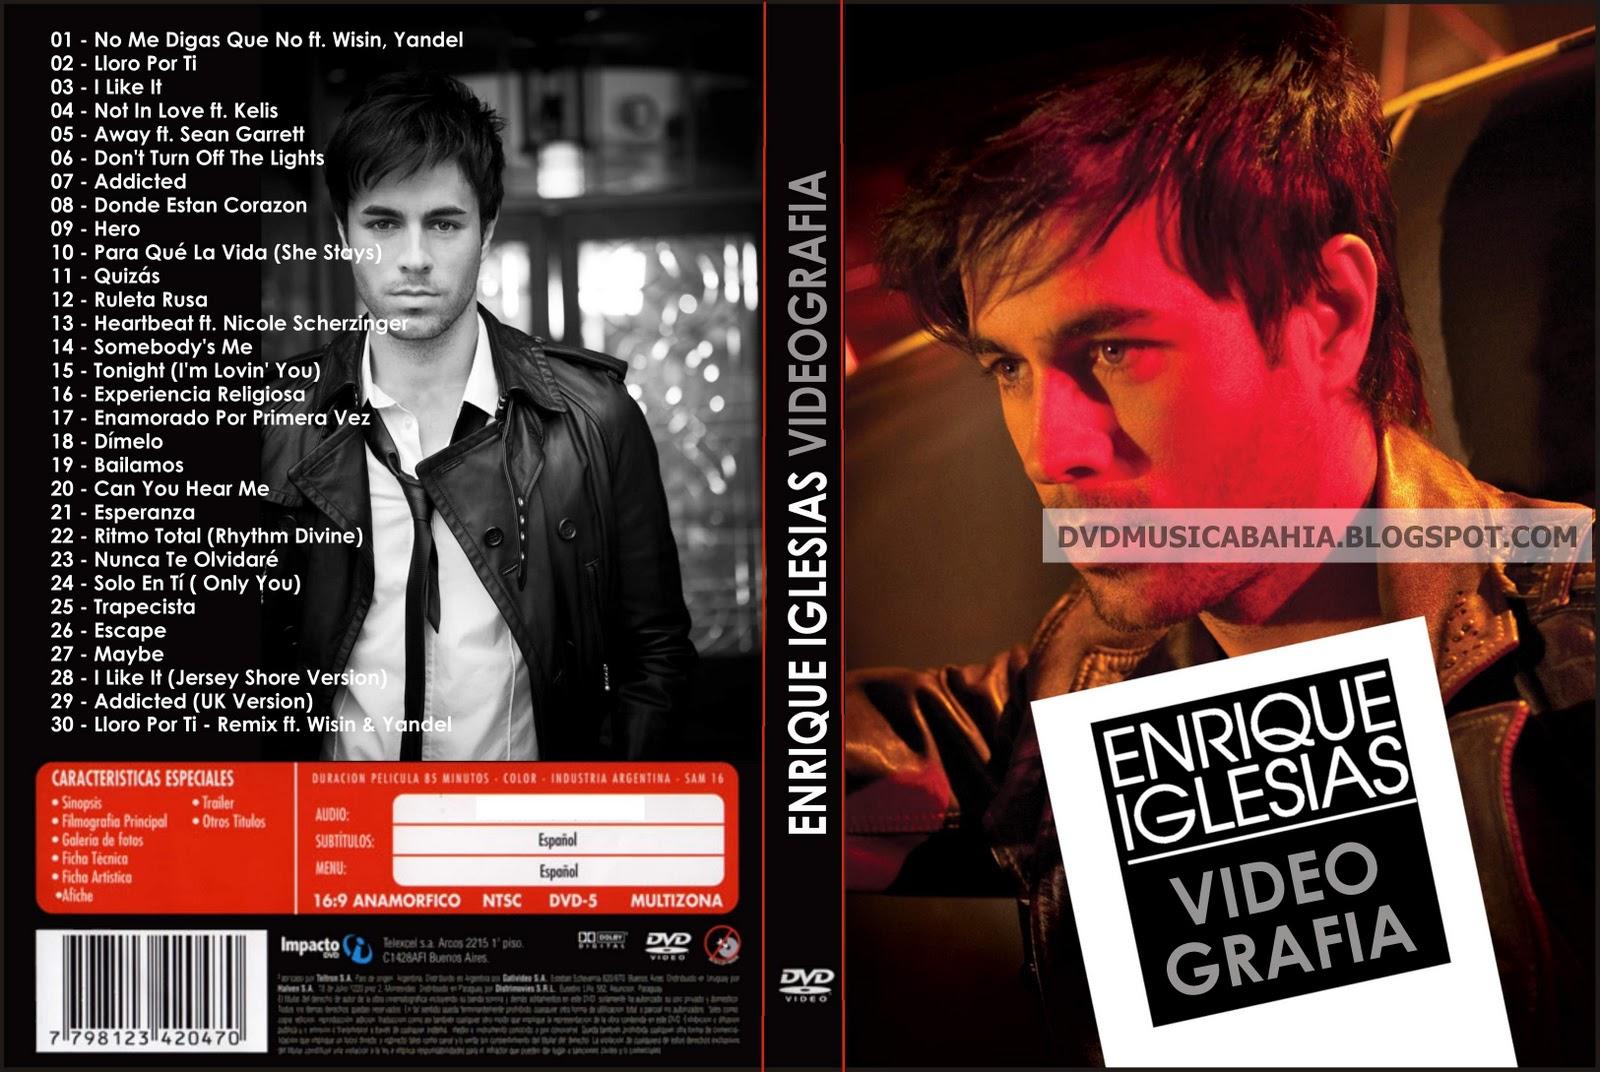 http://4.bp.blogspot.com/-2q1uBhSyj0g/TnpmVKn64AI/AAAAAAAAByU/am4x9SB1X9g/s1600/Enrique+Iglesias+-+Videografia+-+2011.jpg